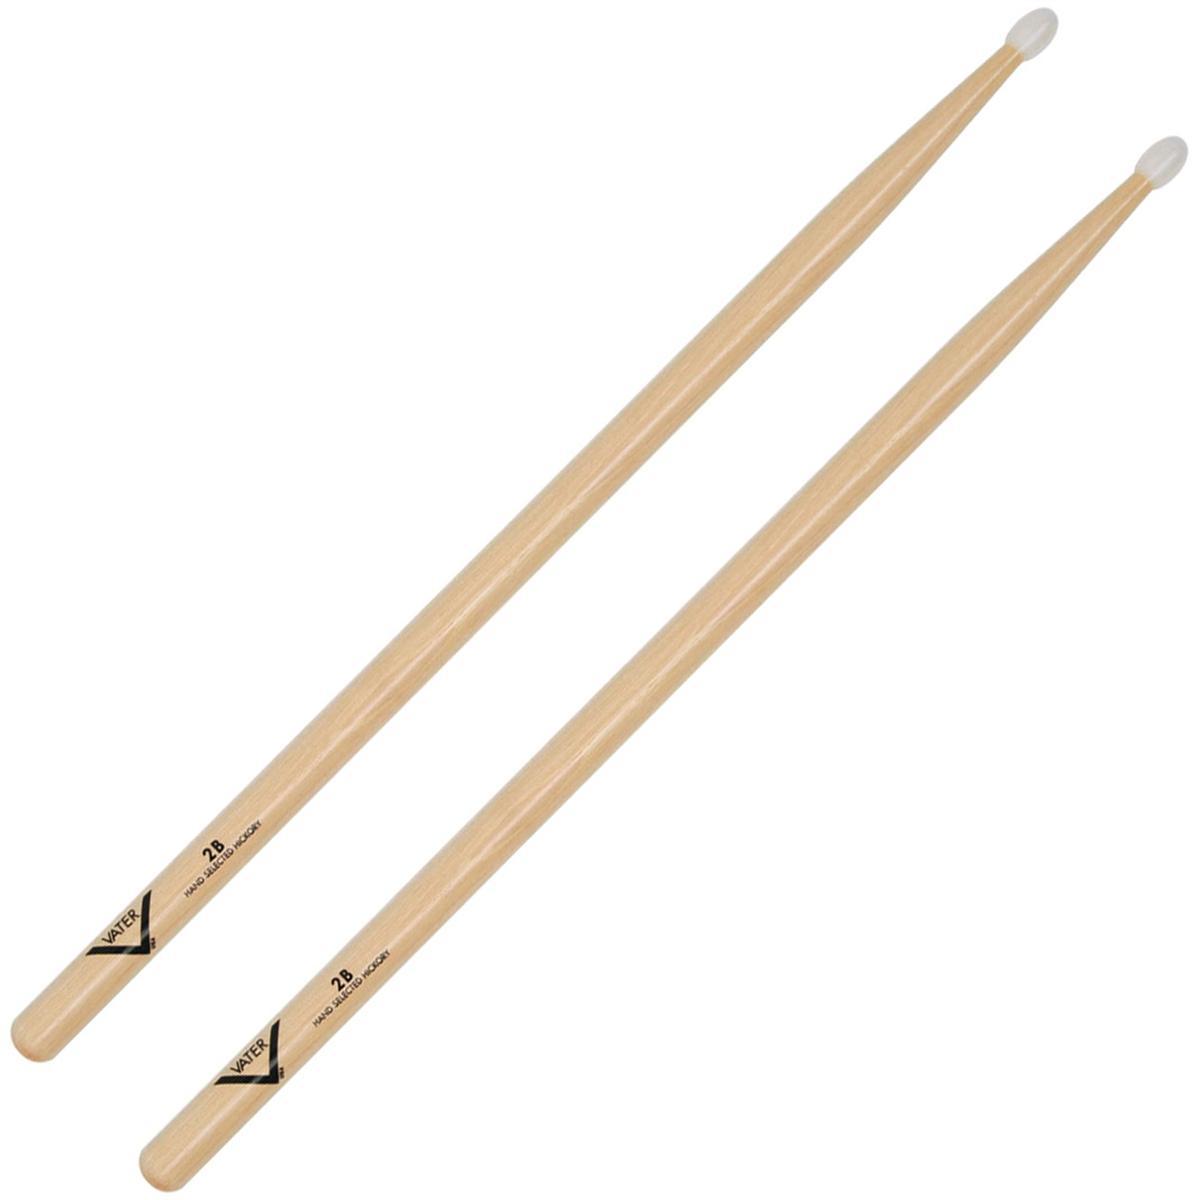 Drum mallets clipart - Clipground